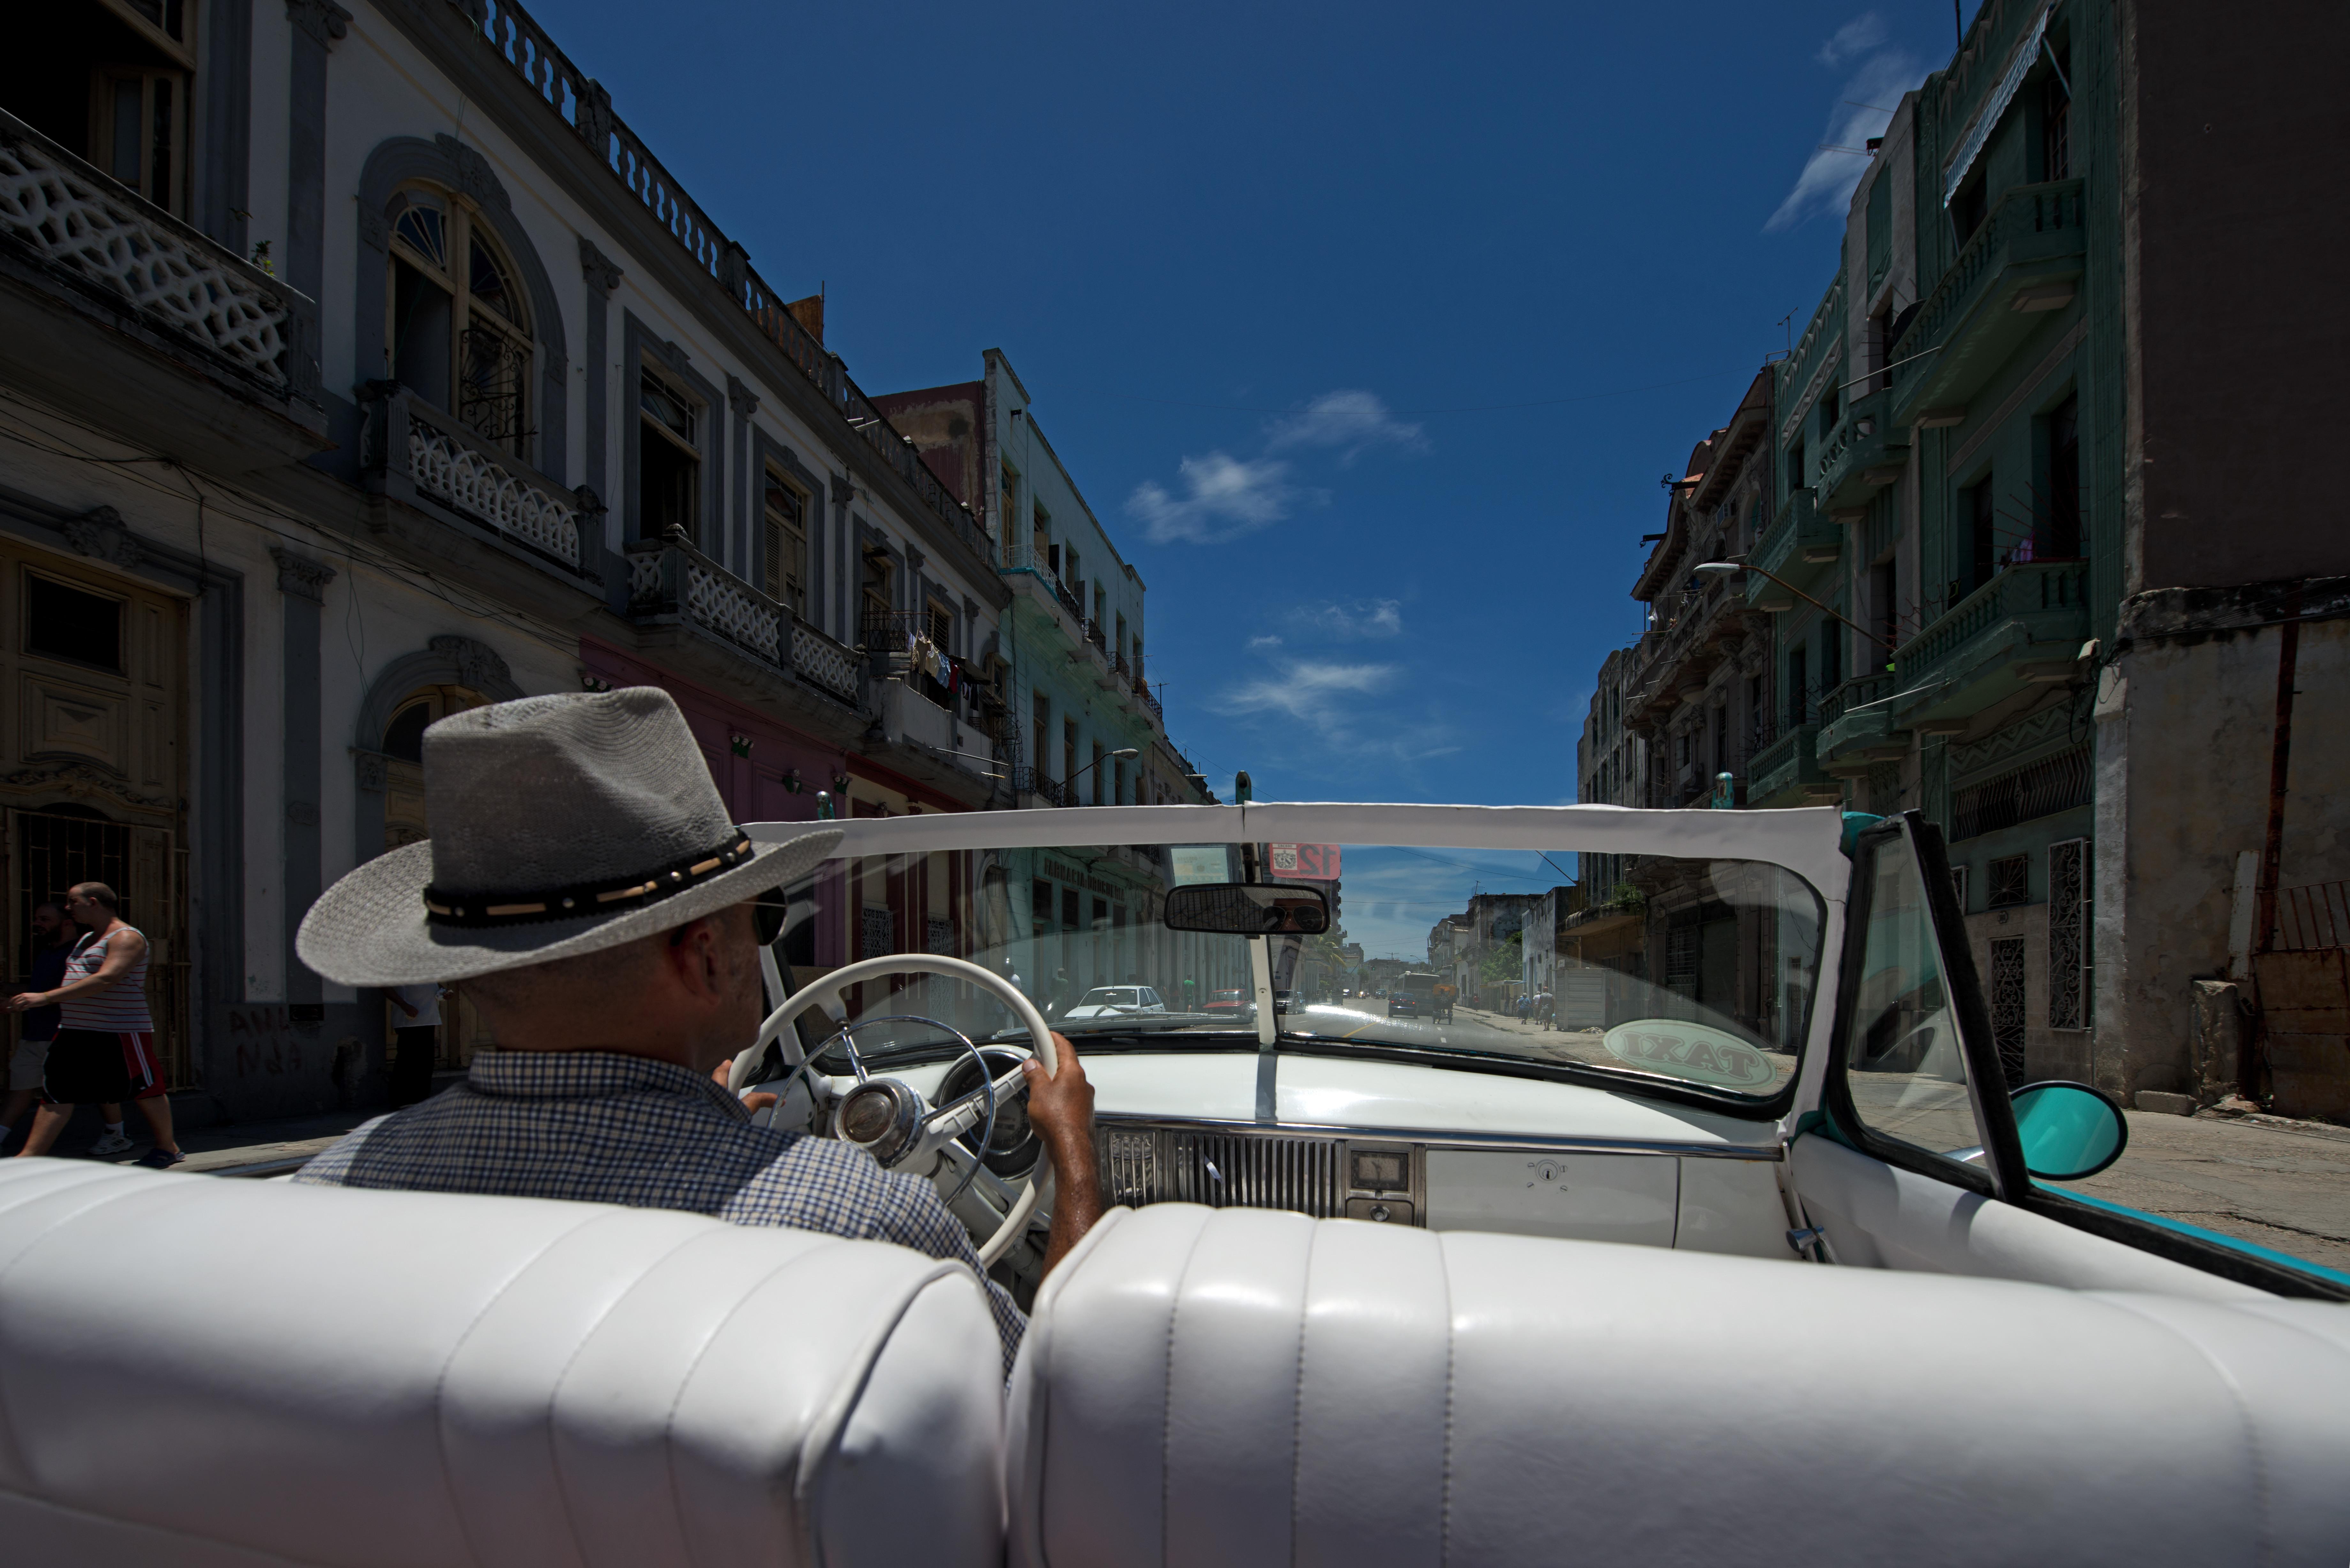 Habana_Crysler1949_2_2805Habana_Crysler1949_2low